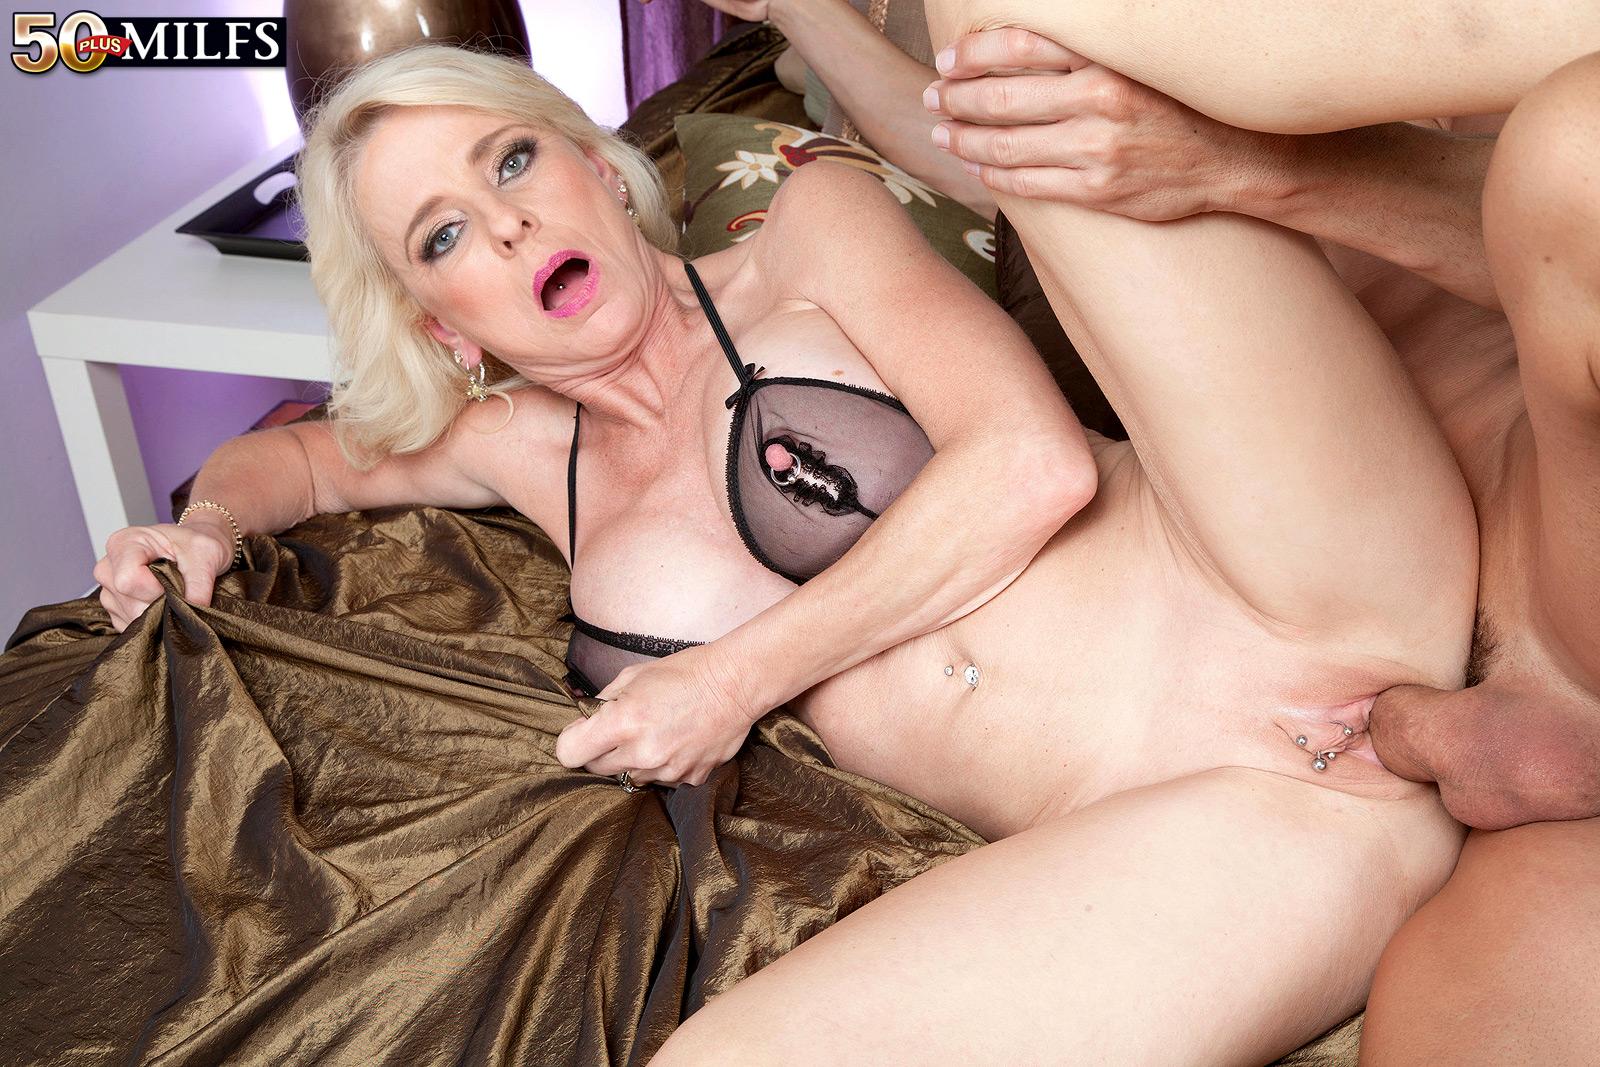 sex movie older woman